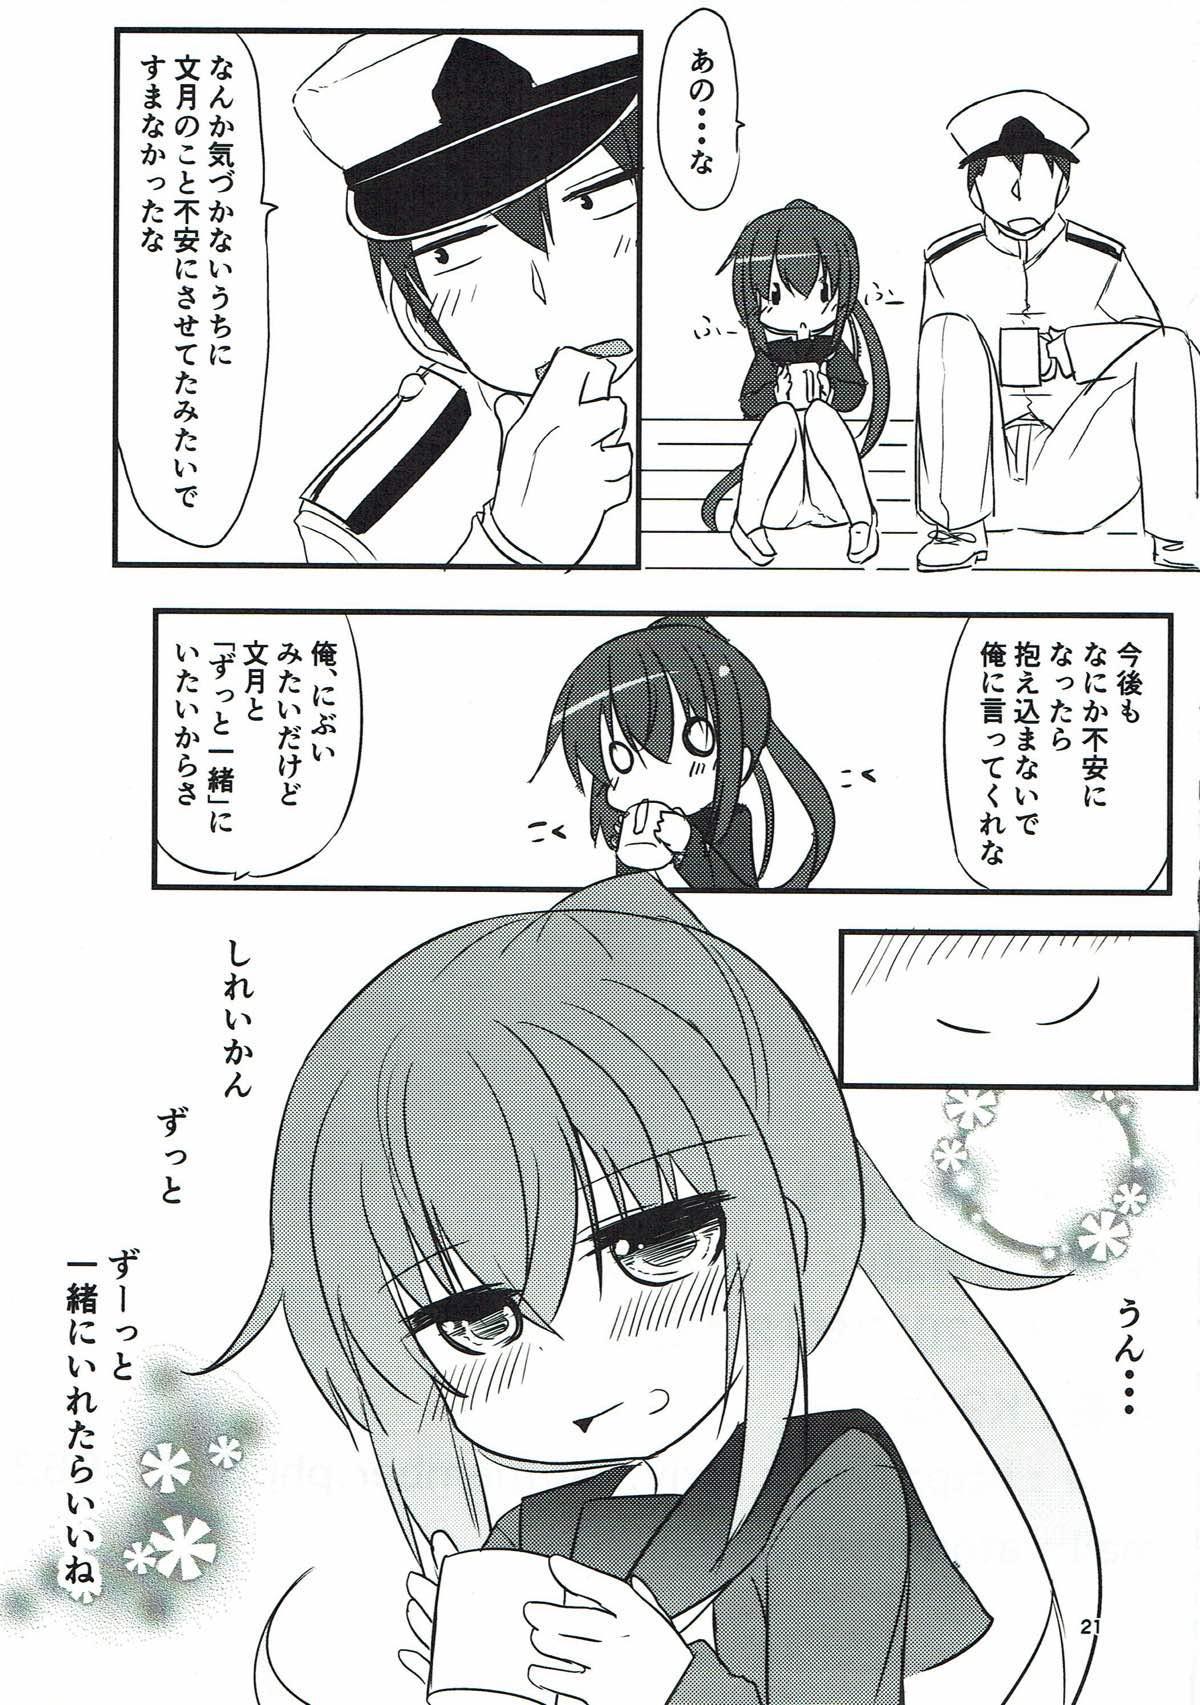 Fumizuki datte Chanto Dekirun dakara! 19